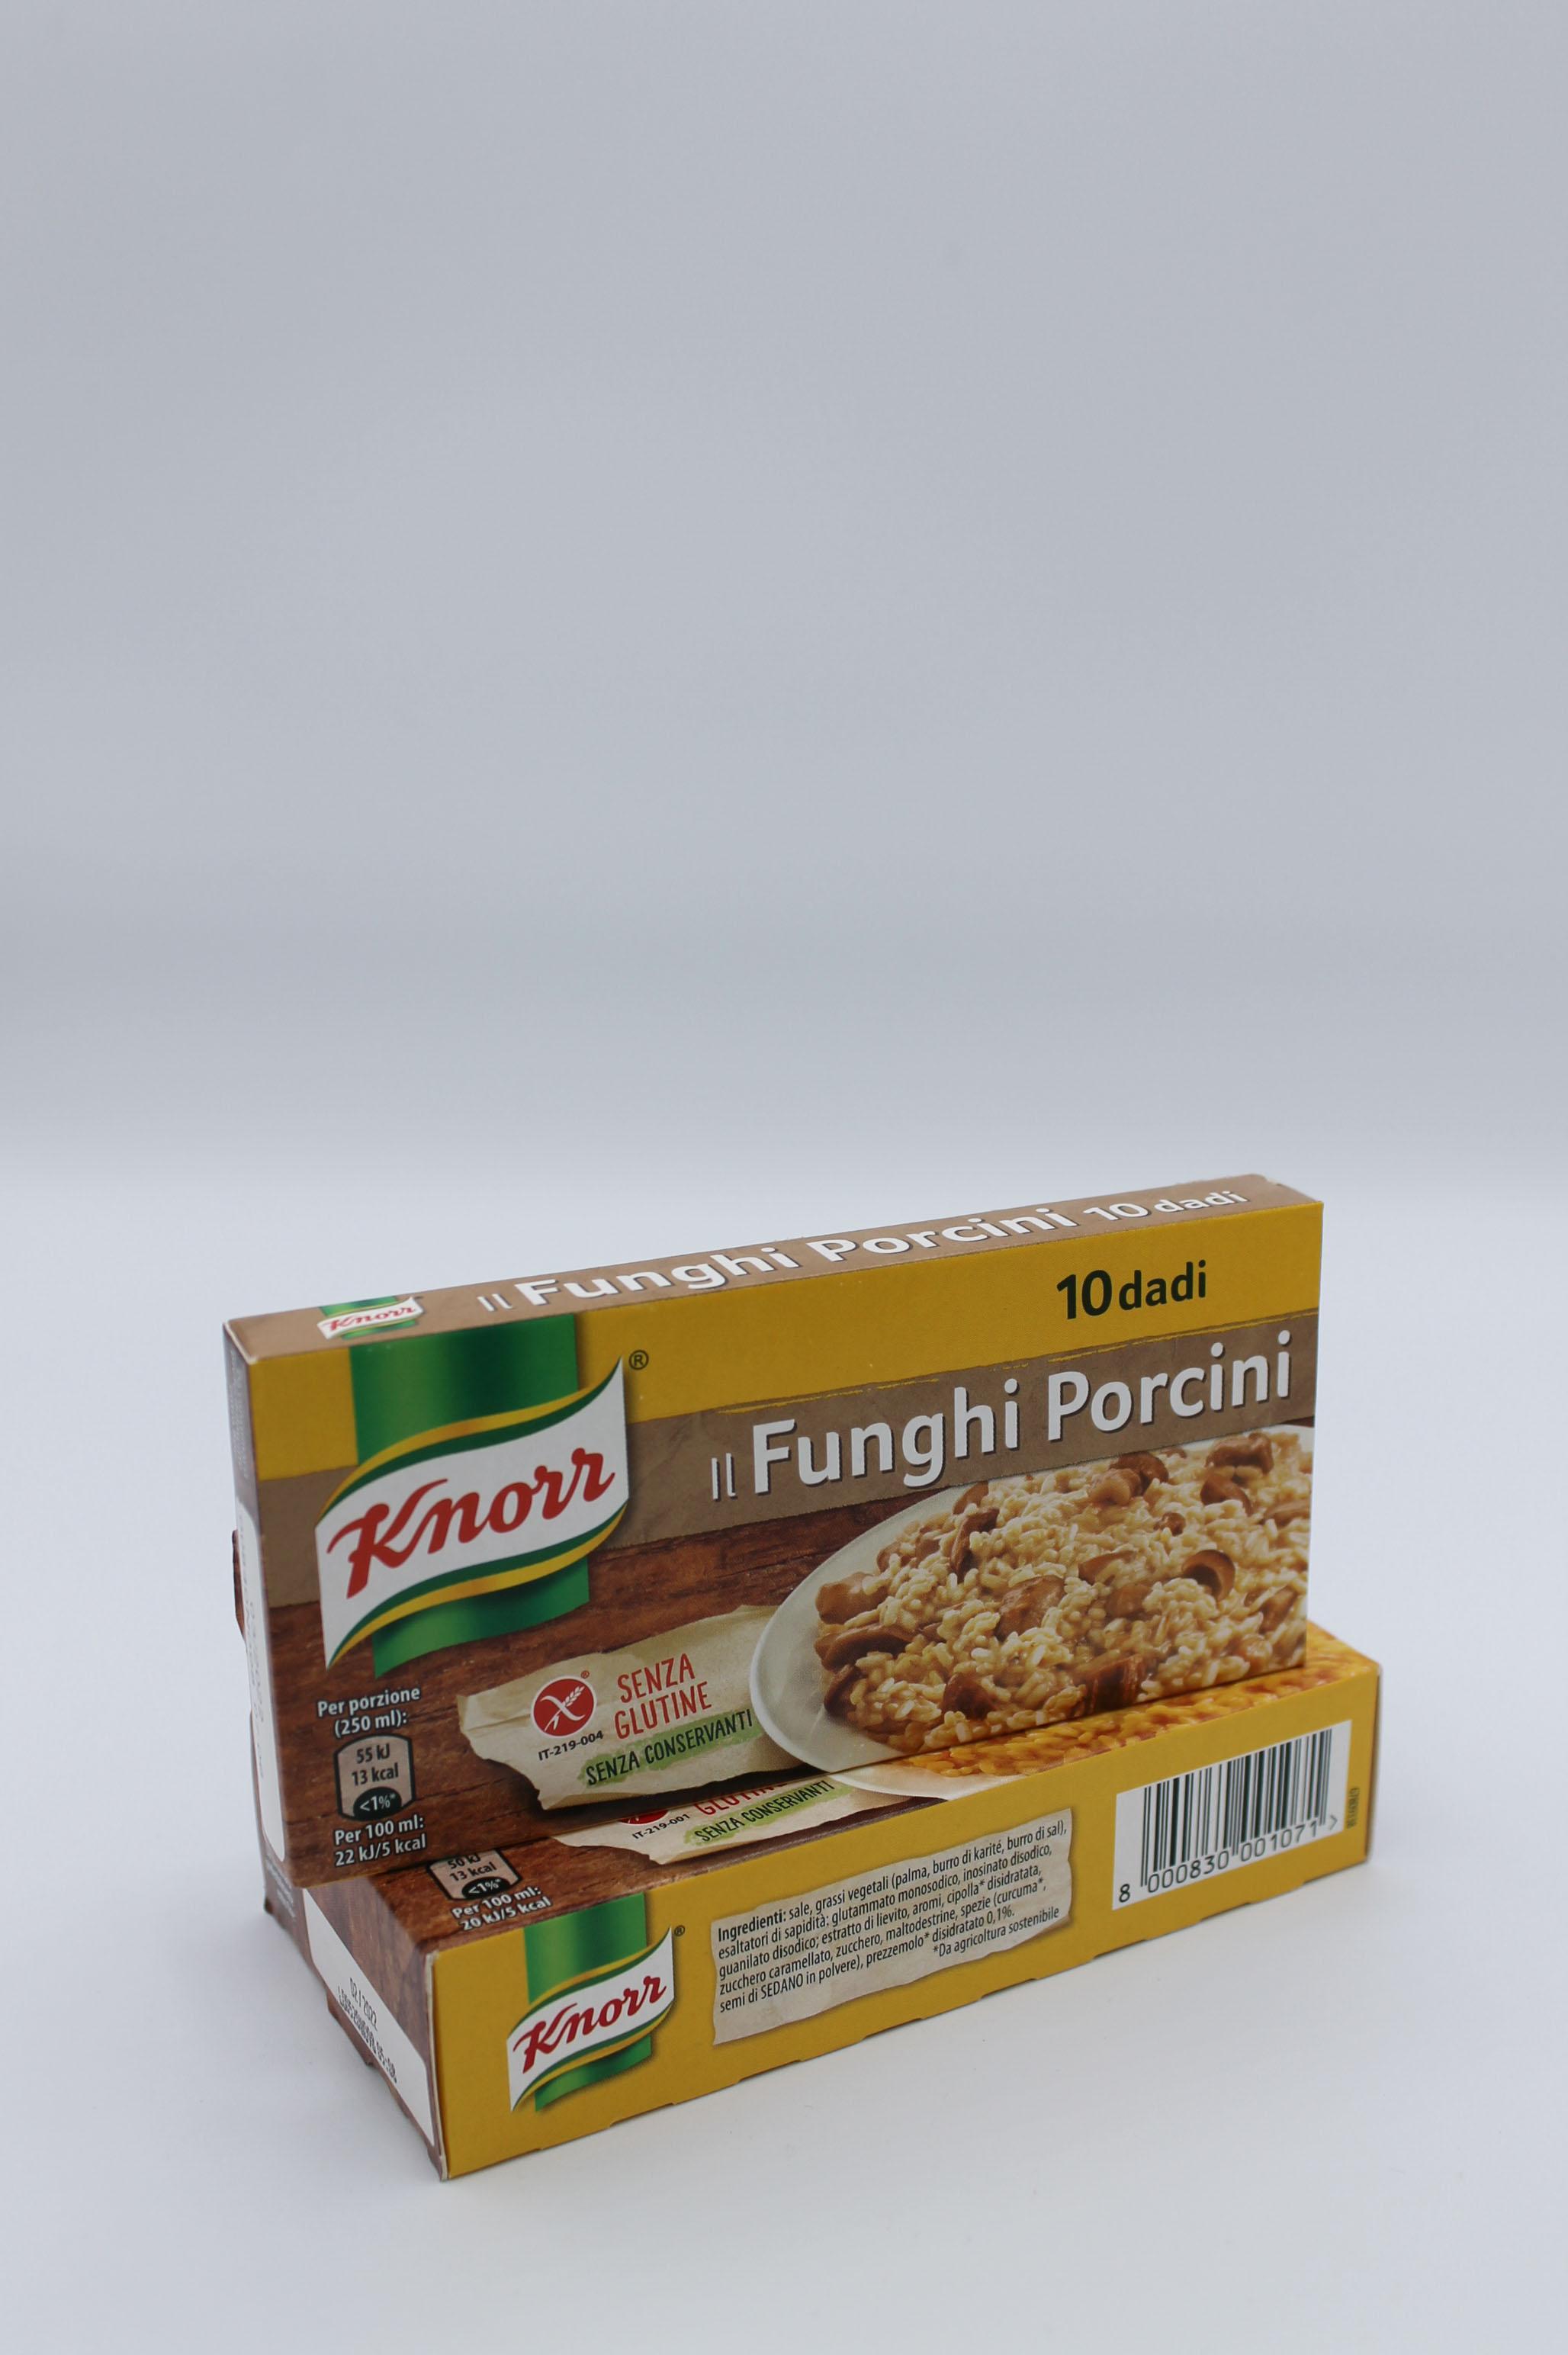 Knorr dado funghi porcini 100 gr.